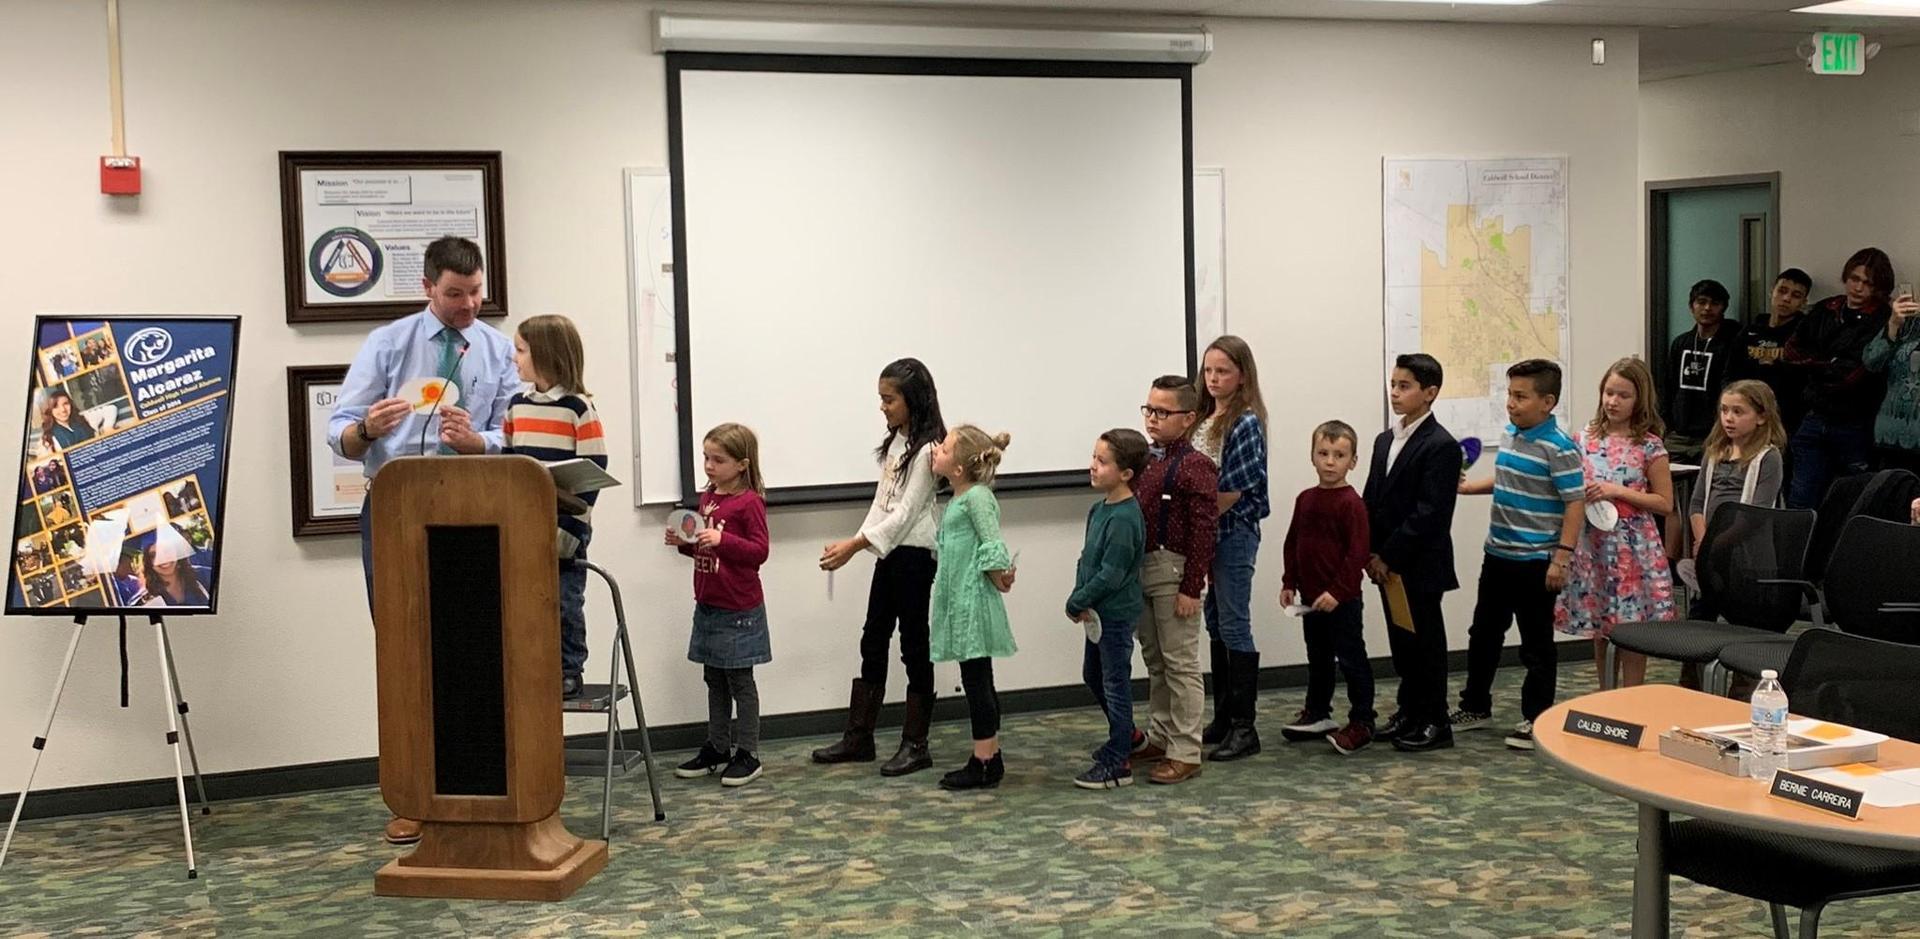 Lewis & Clark students presenting